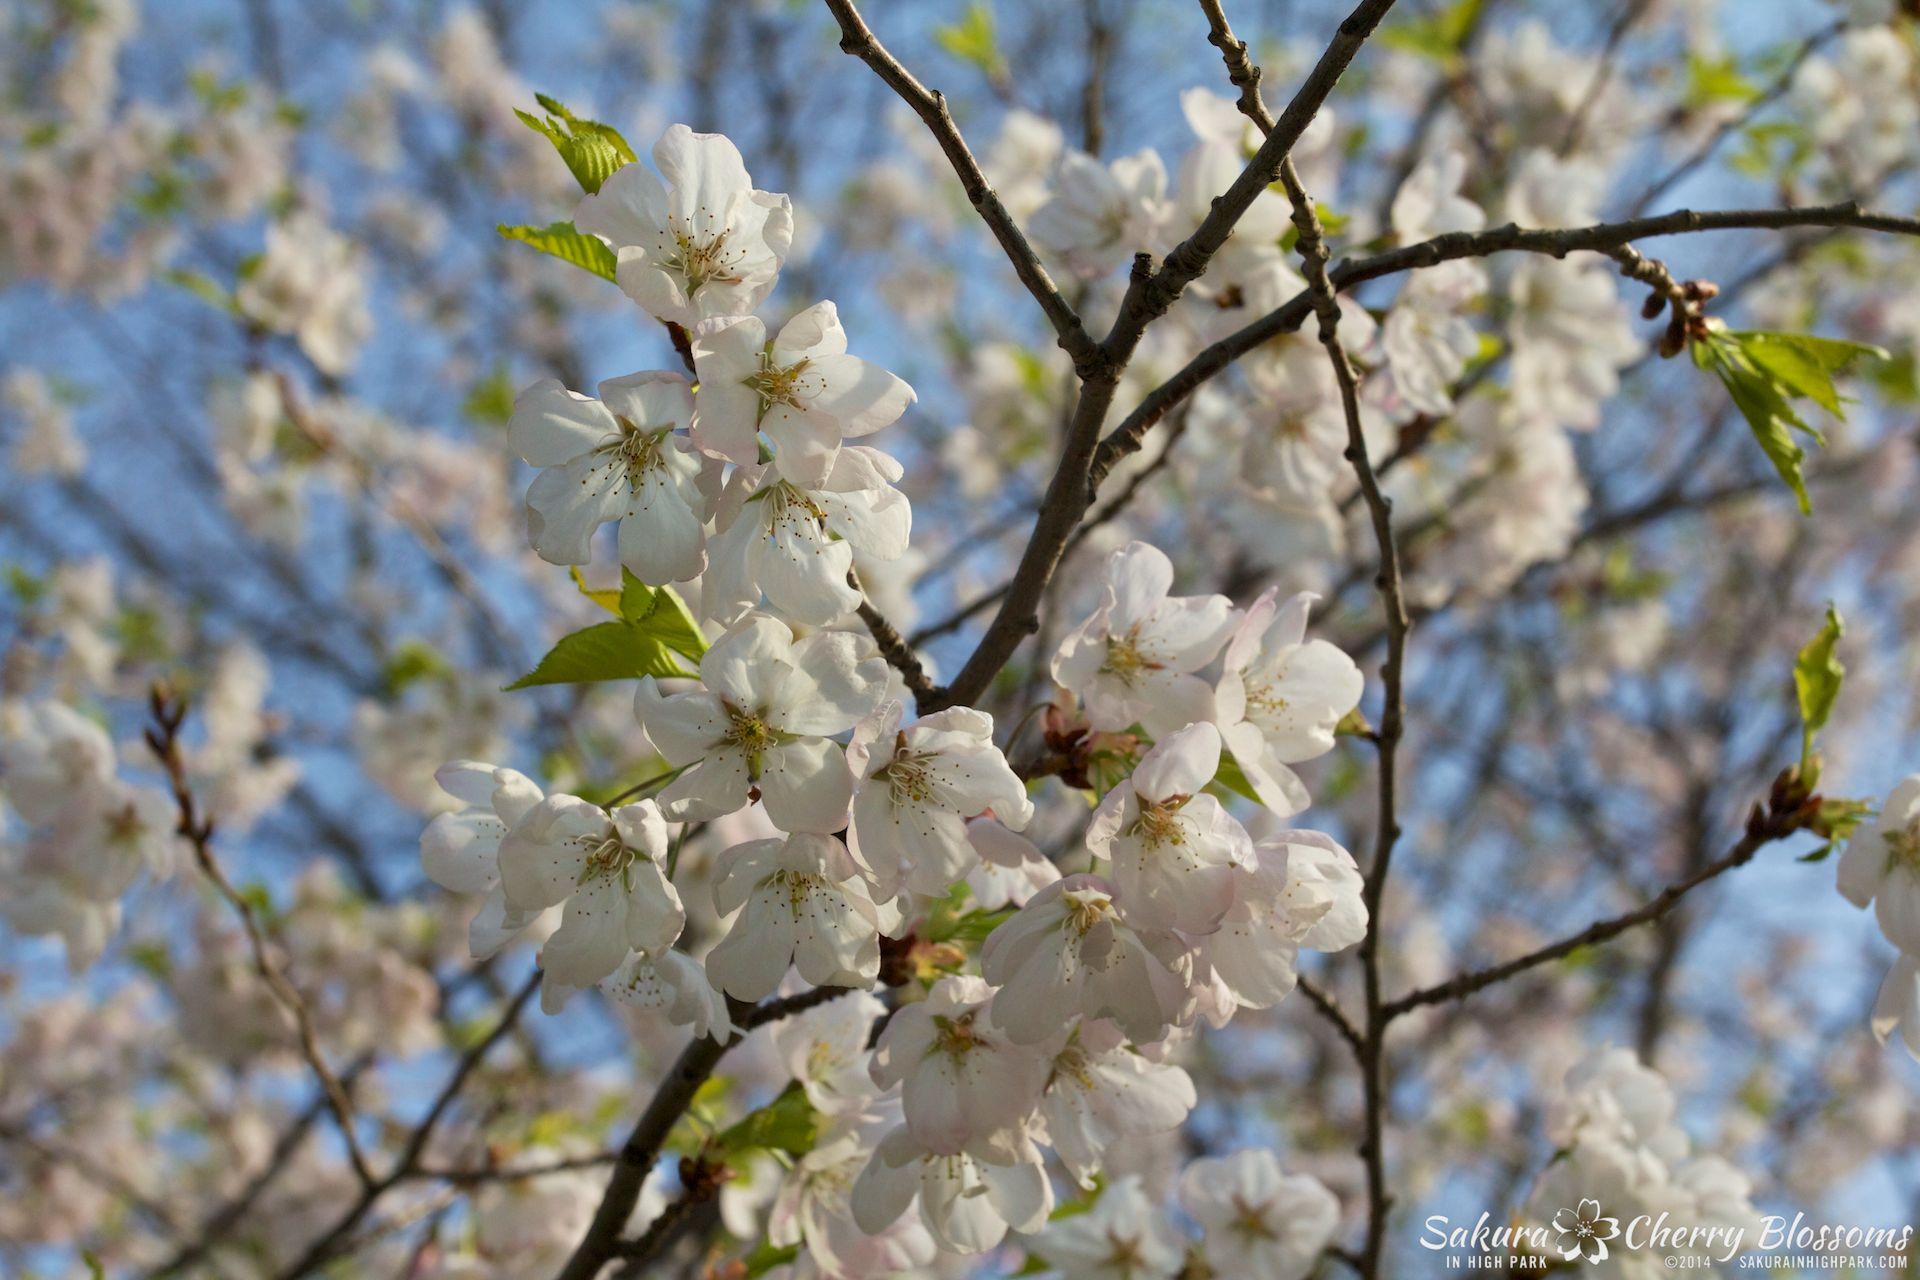 SakuraInHighPark-May1314-352.jpg